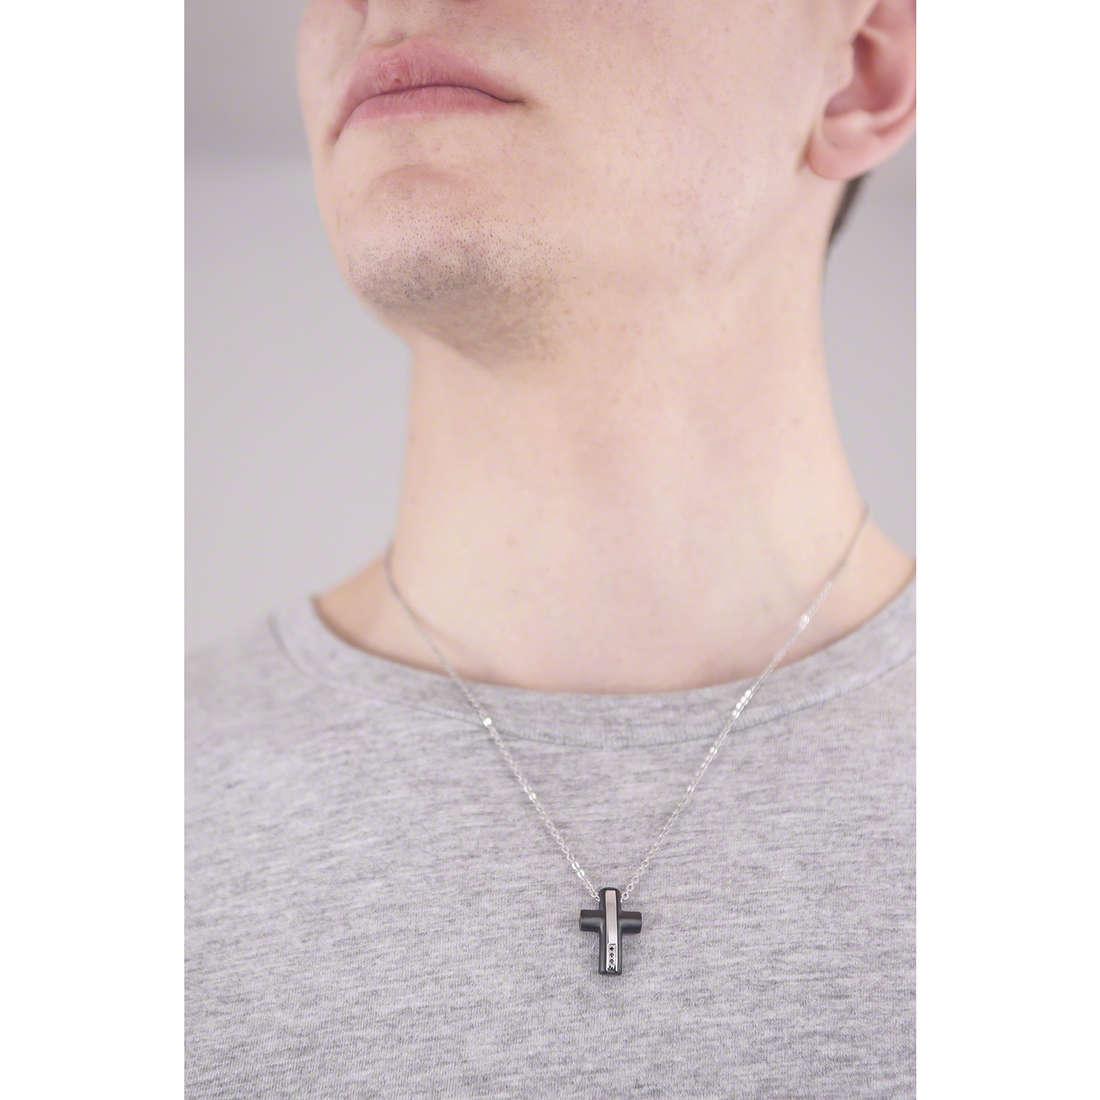 4US Cesare Paciotti necklaces man 4UCL1242 indosso